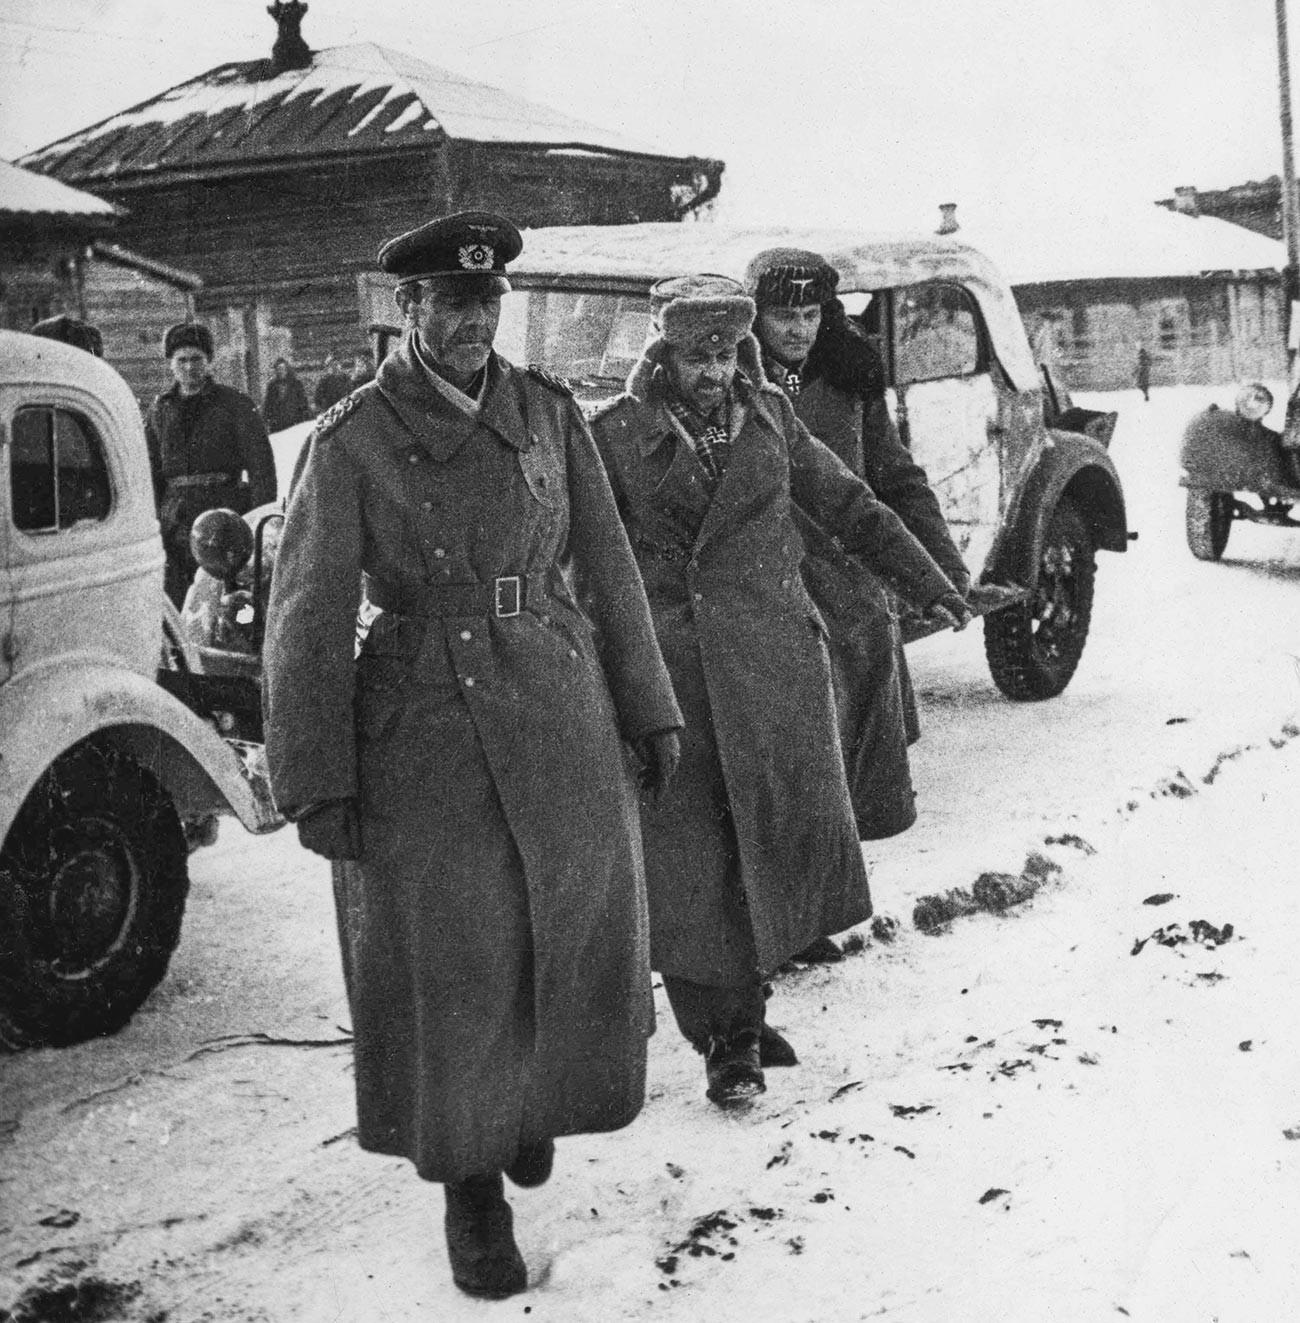 Marsekal Lapangan Friedrich Paulus dan stafnya ditawan di Stalingrad.